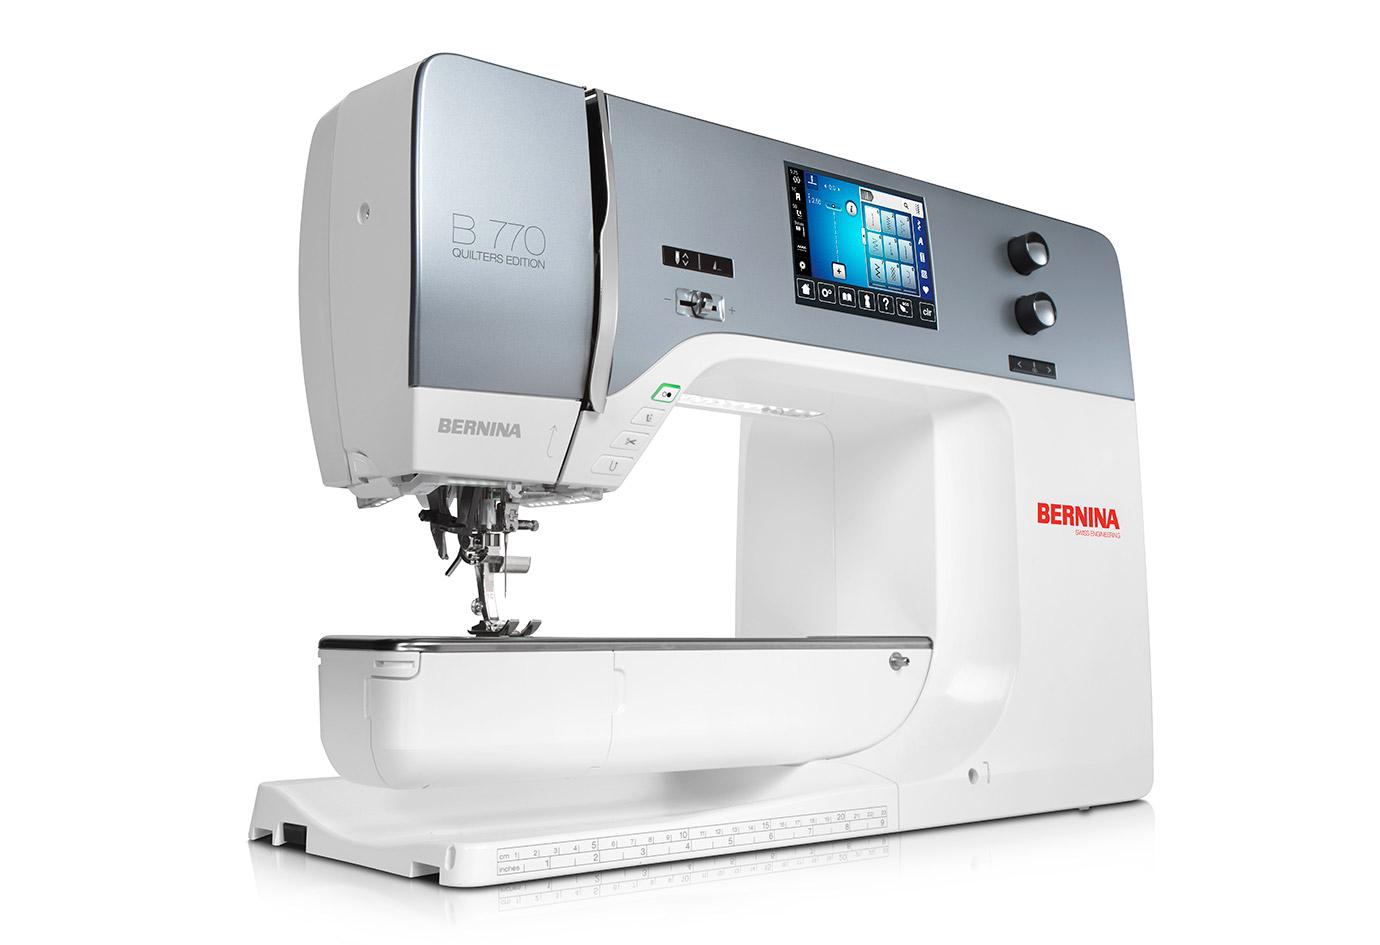 hight resolution of brand new bernina qe for sale never used opened box jpg 1380x945 used bernina sewing machines